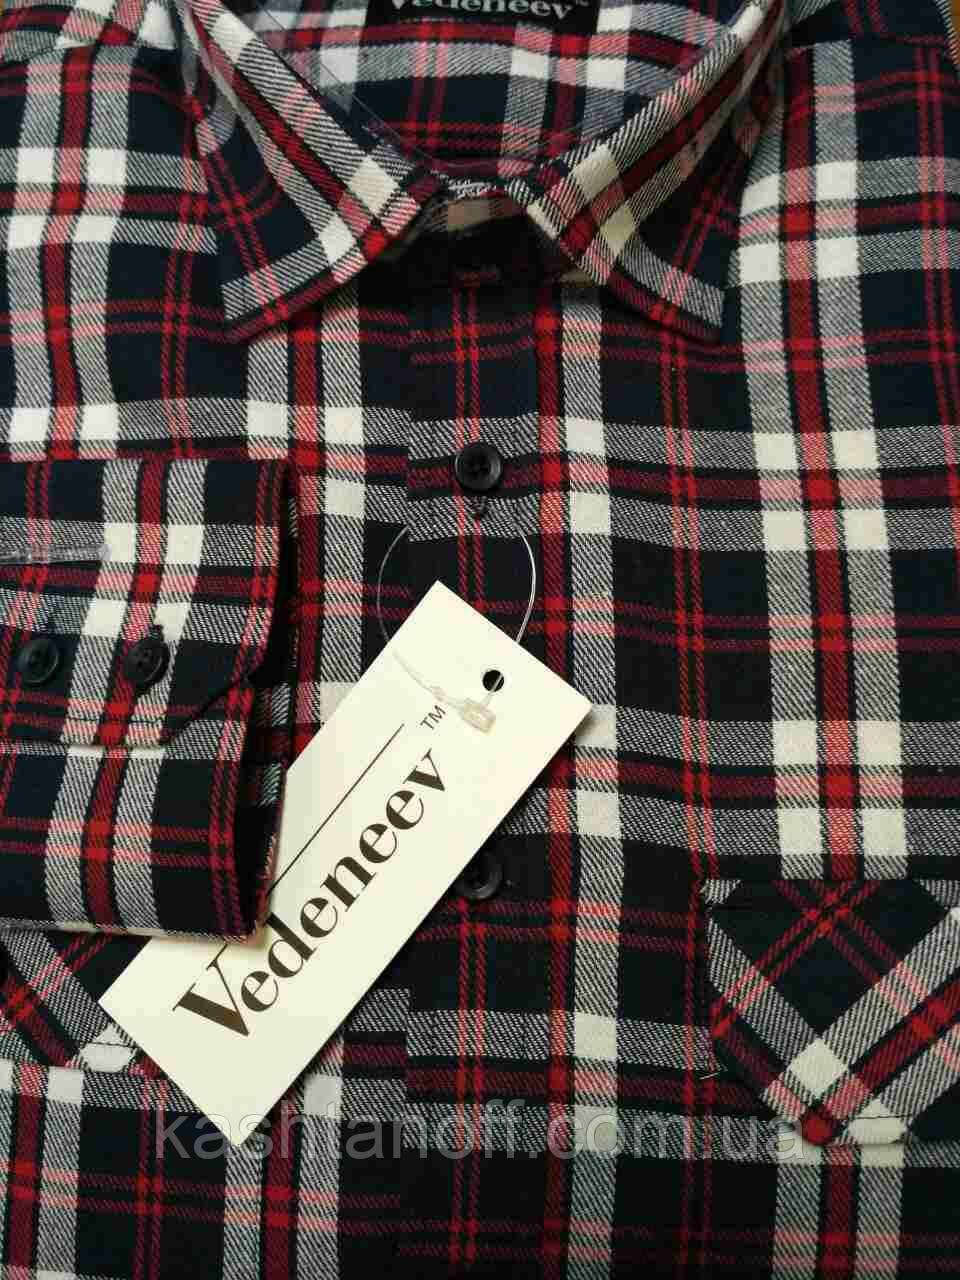 d61a89b153c Сине-красная фланелевая рубашка в клетку с двумя карманами  продажа ...